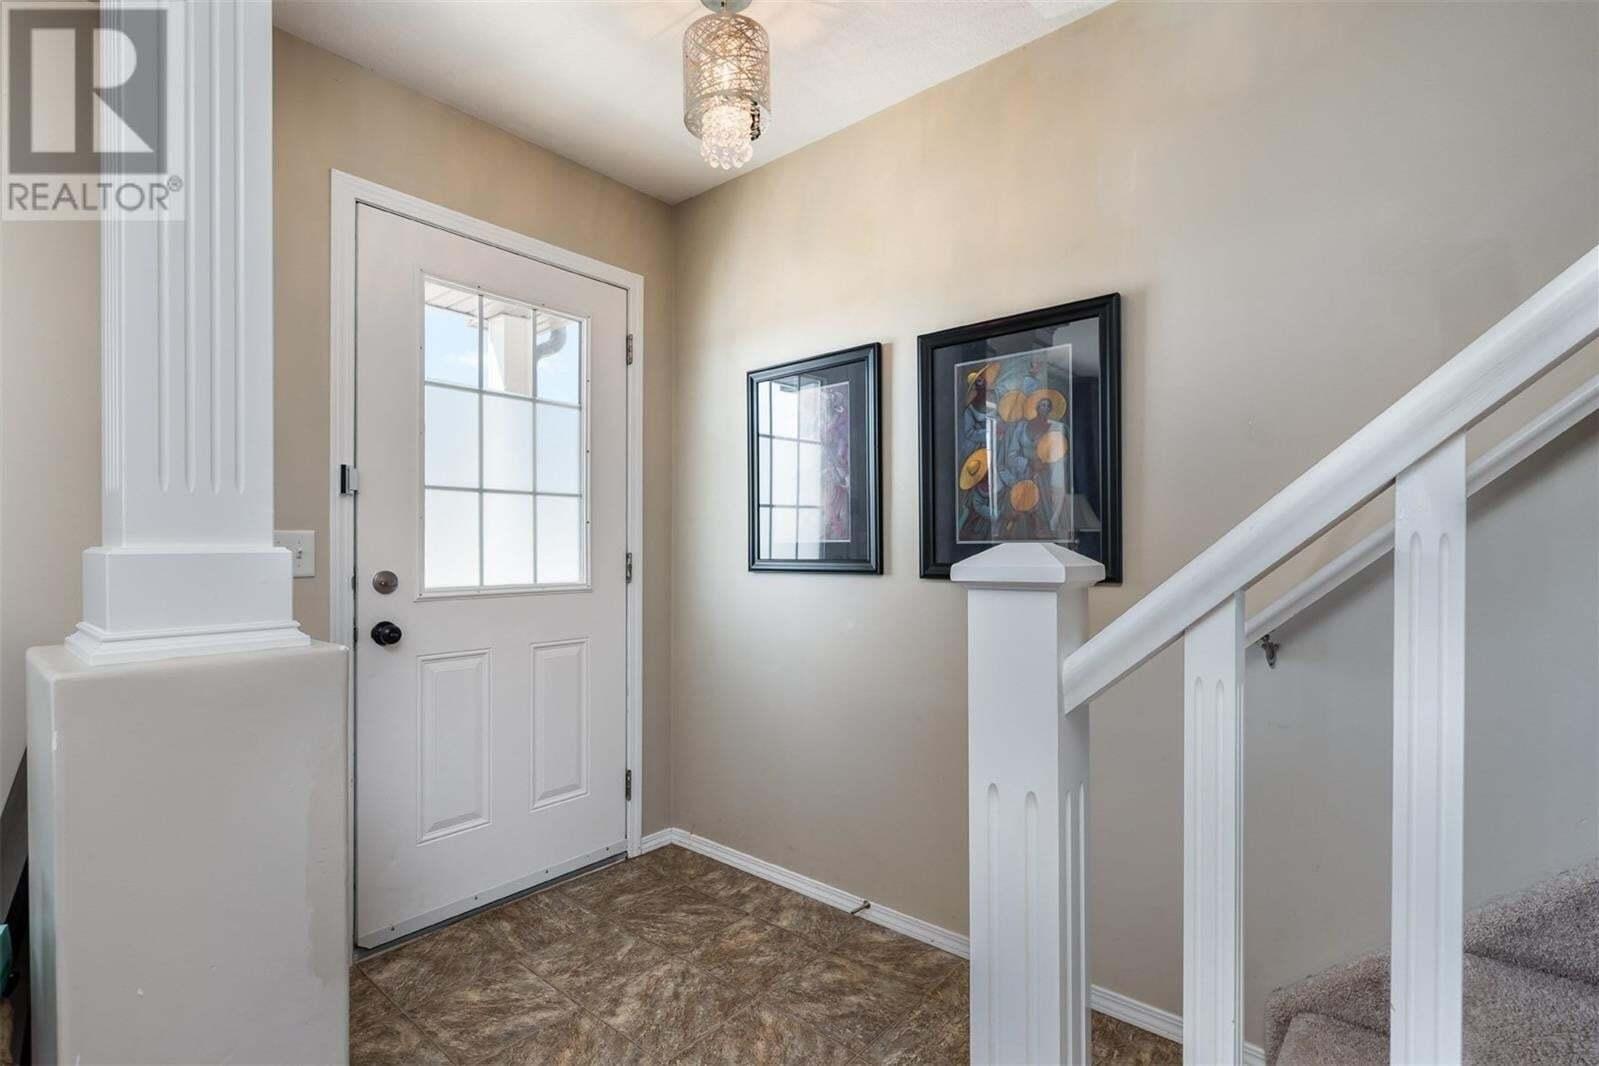 Townhouse for sale at 700 2nd Ave S Unit 144 Martensville Saskatchewan - MLS: SK828243